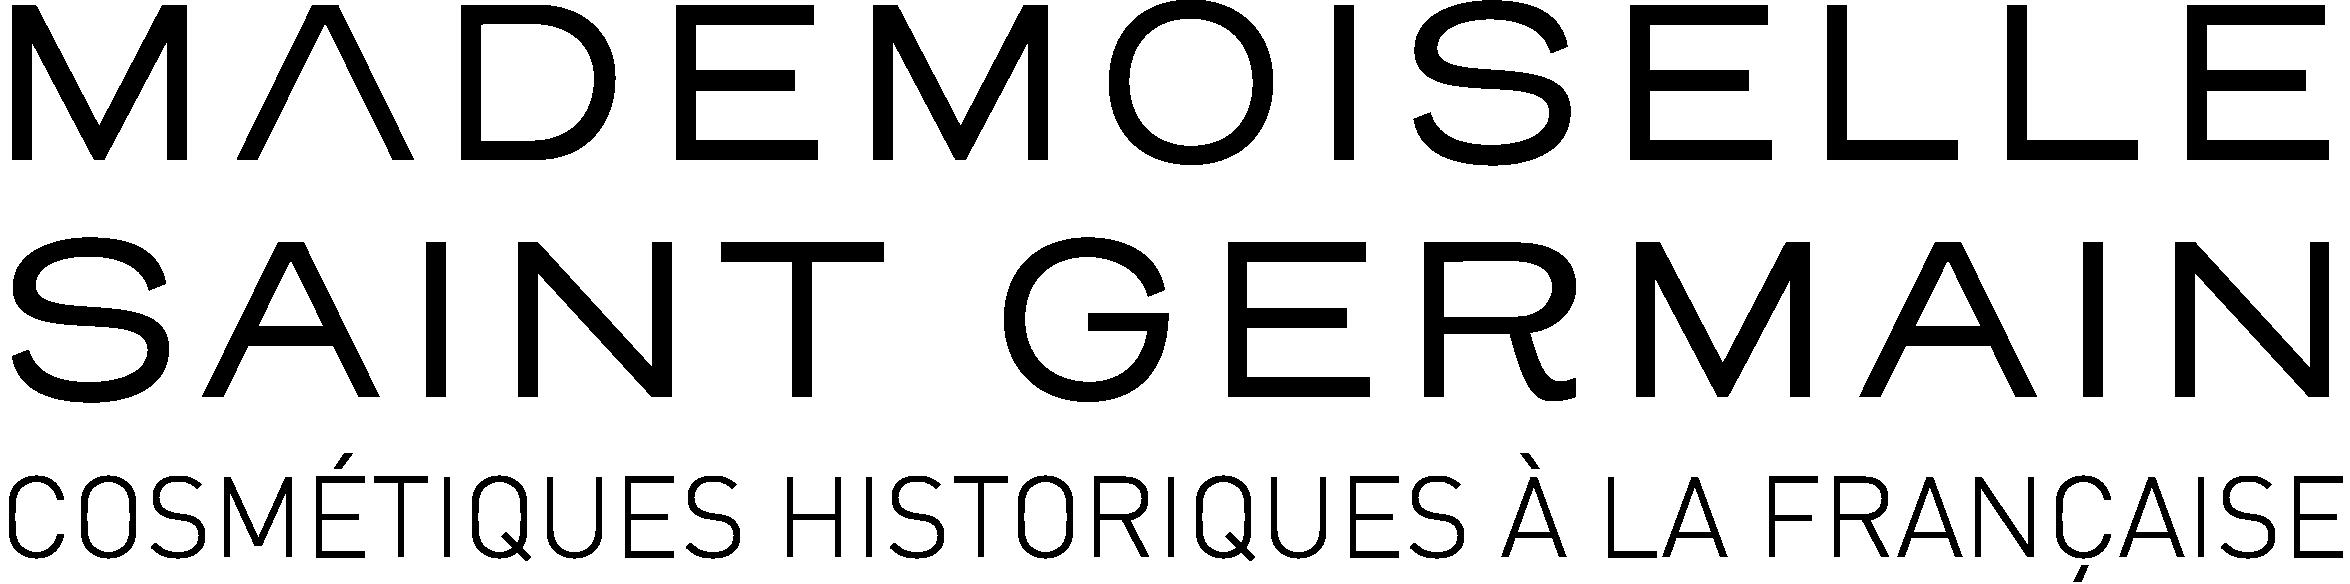 Logo msg lin aire devise